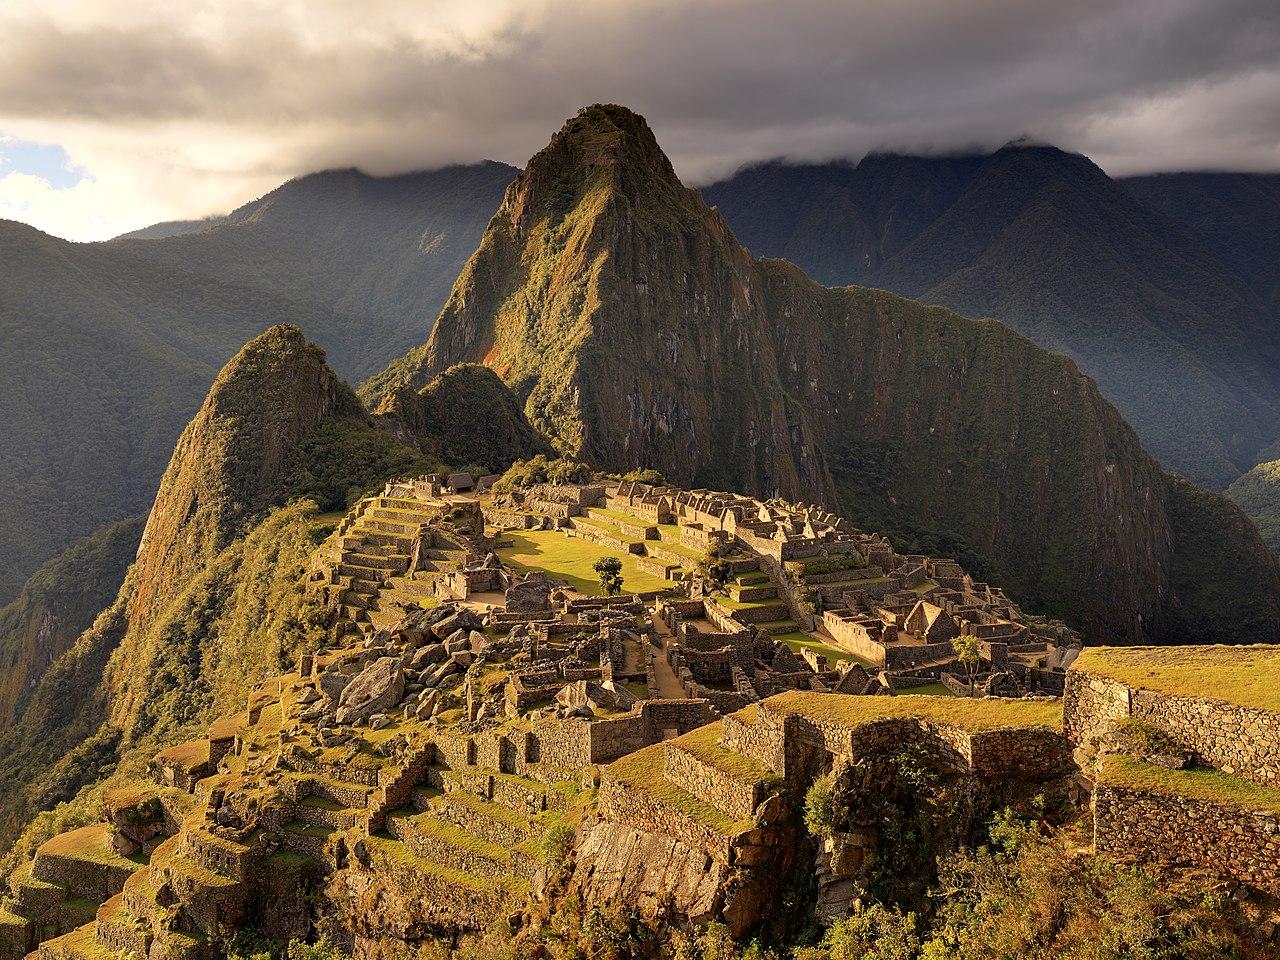 Machu Picchu by Martin St-Amant (S23678) Wikimedia Commons